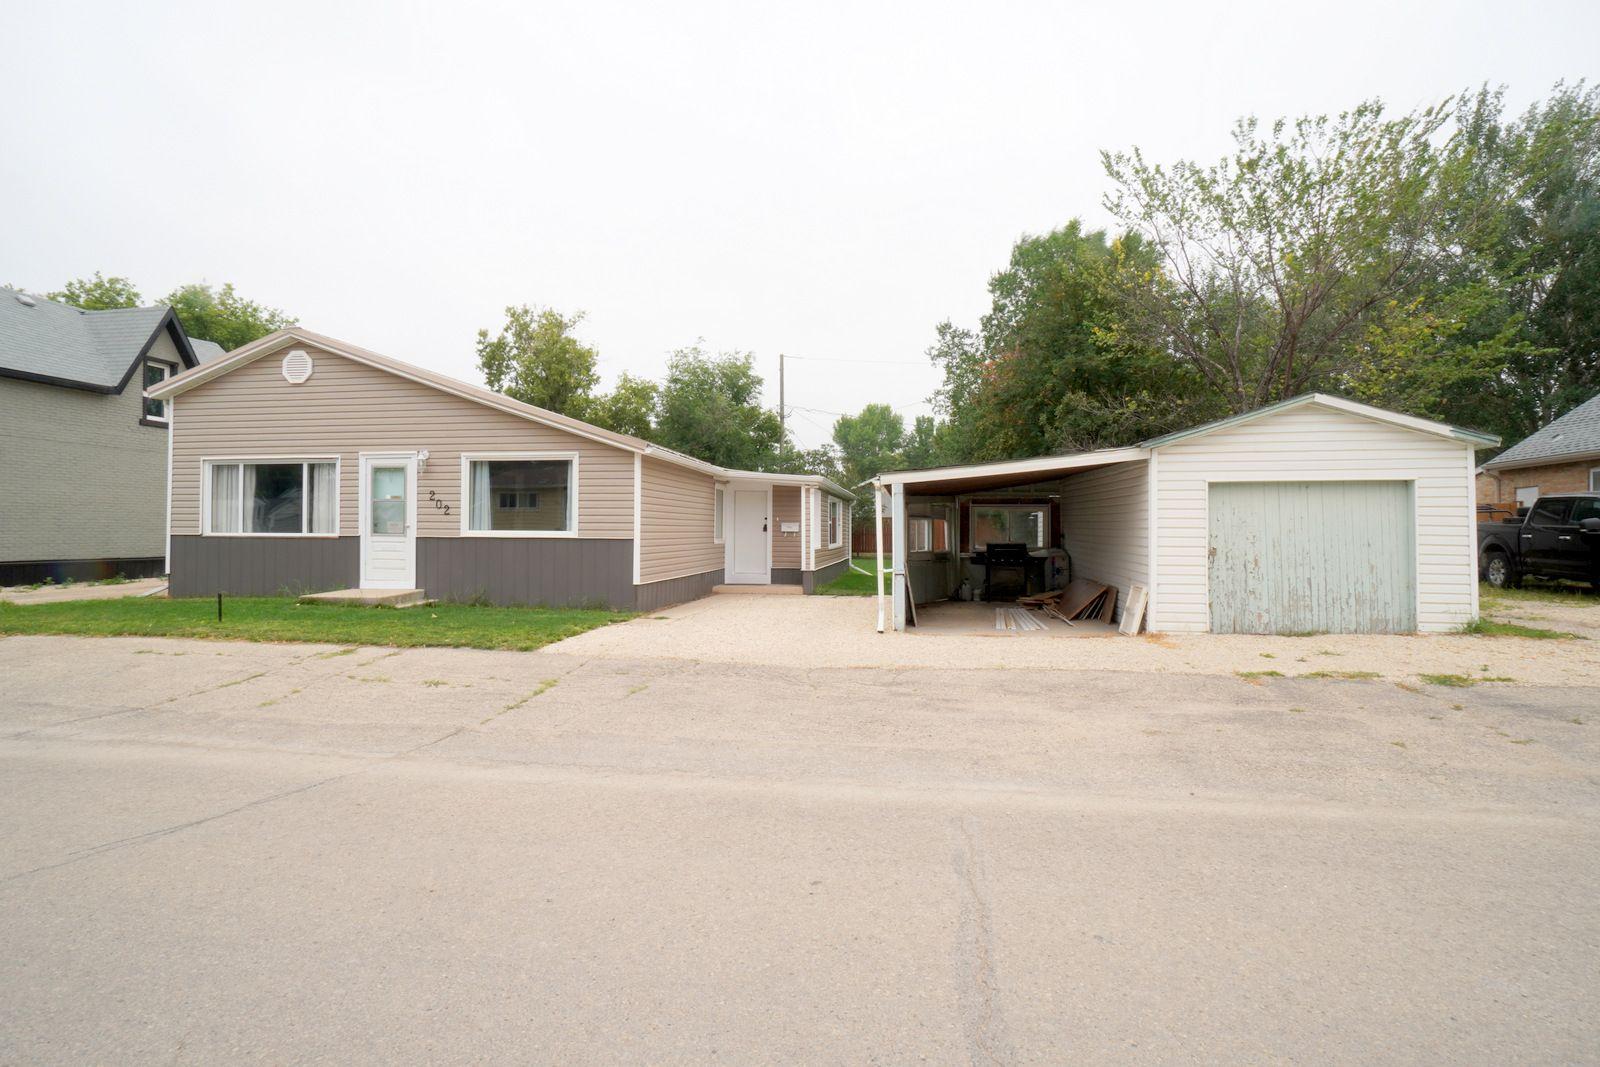 Main Photo: 202 6th Ave NE in Portage la Prairie: House for sale : MLS®# 202119392